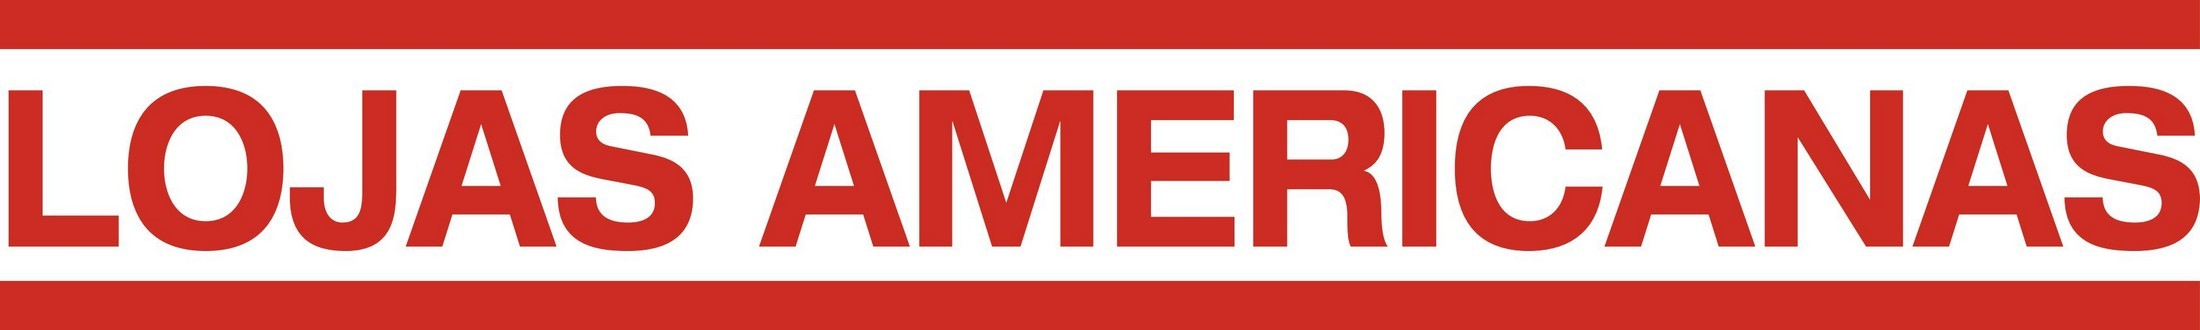 Lojas Americanas Logo [EPS File] png